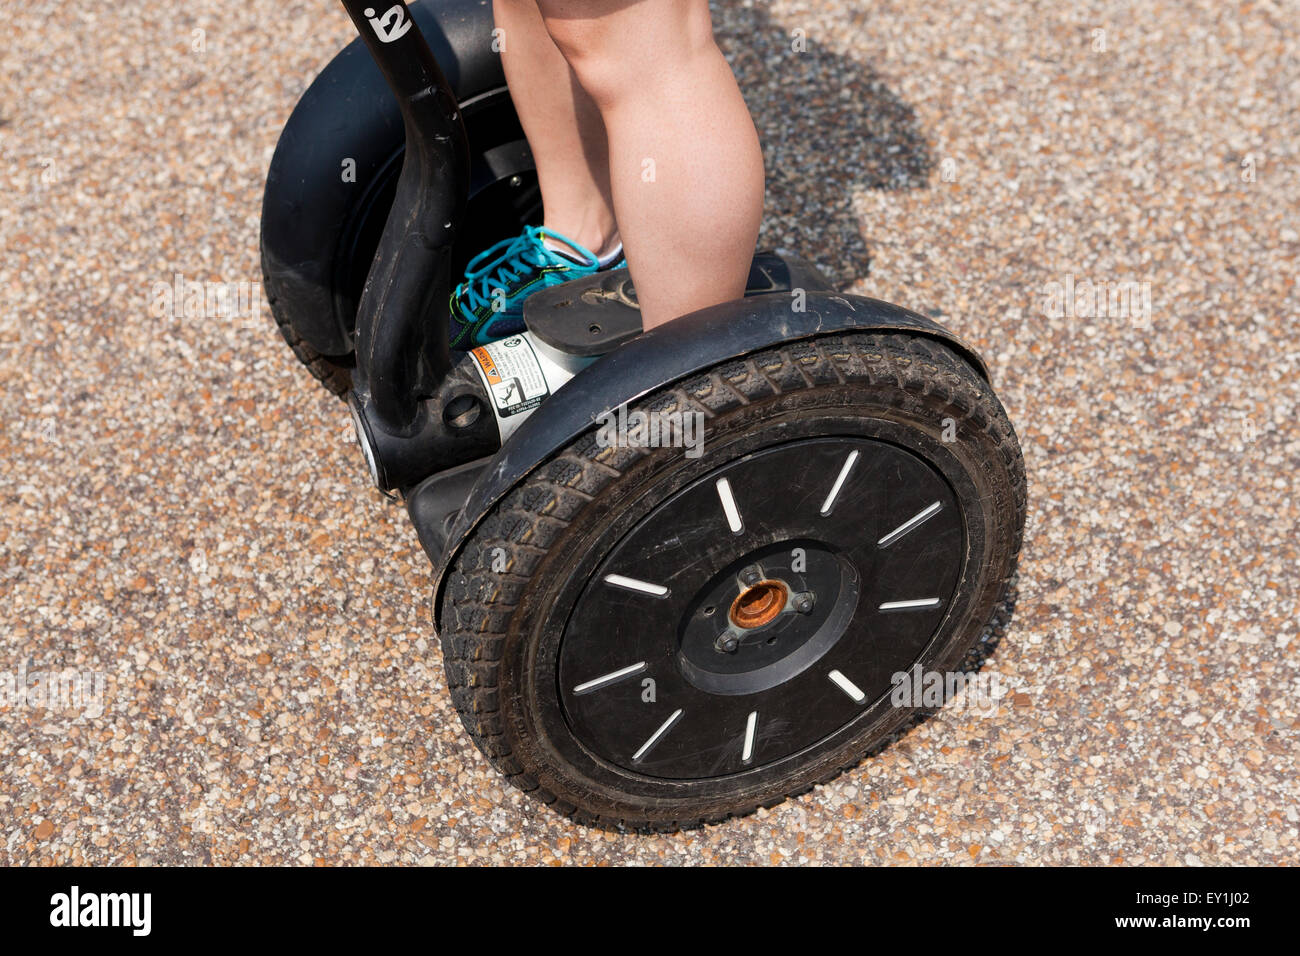 Ruote Segway closeup - USA Immagini Stock